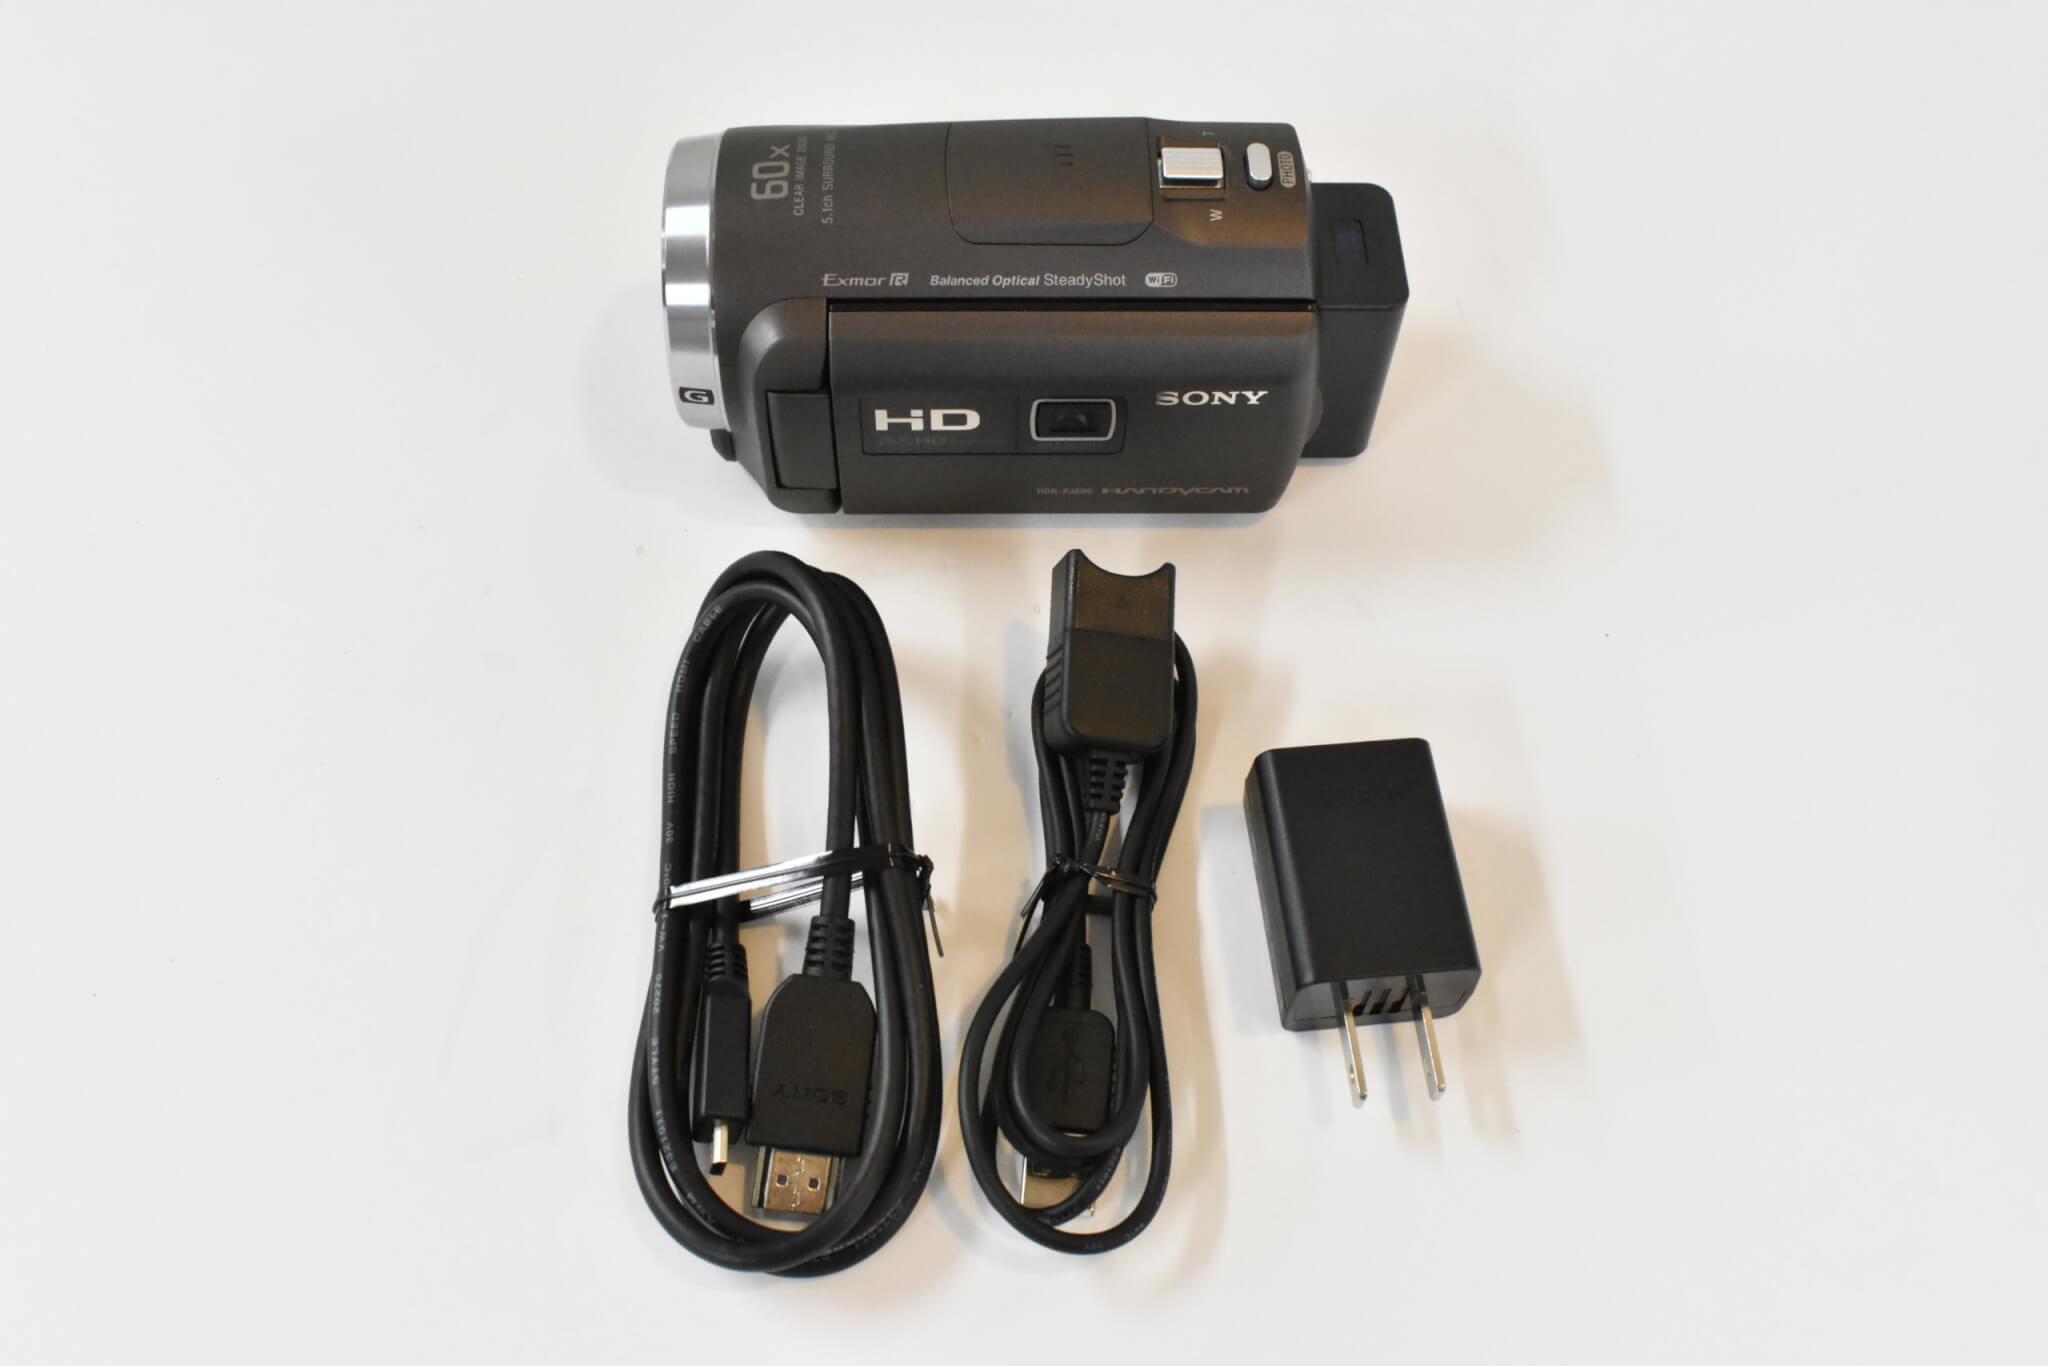 SONYハンディカム 最新全7機種を写真付きで紹介 HDR-PJ680